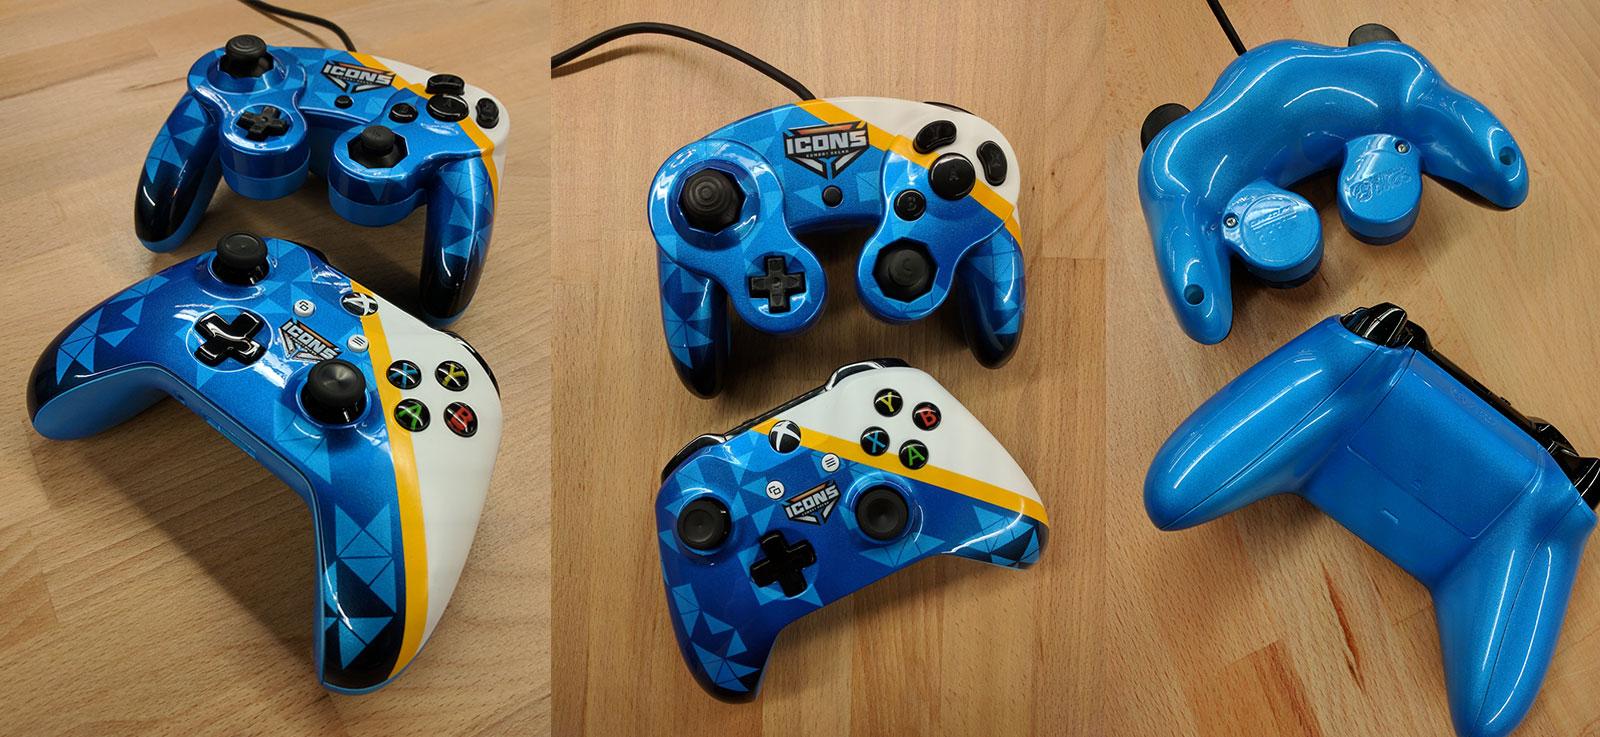 Icons Combat Arena Custom Controllers